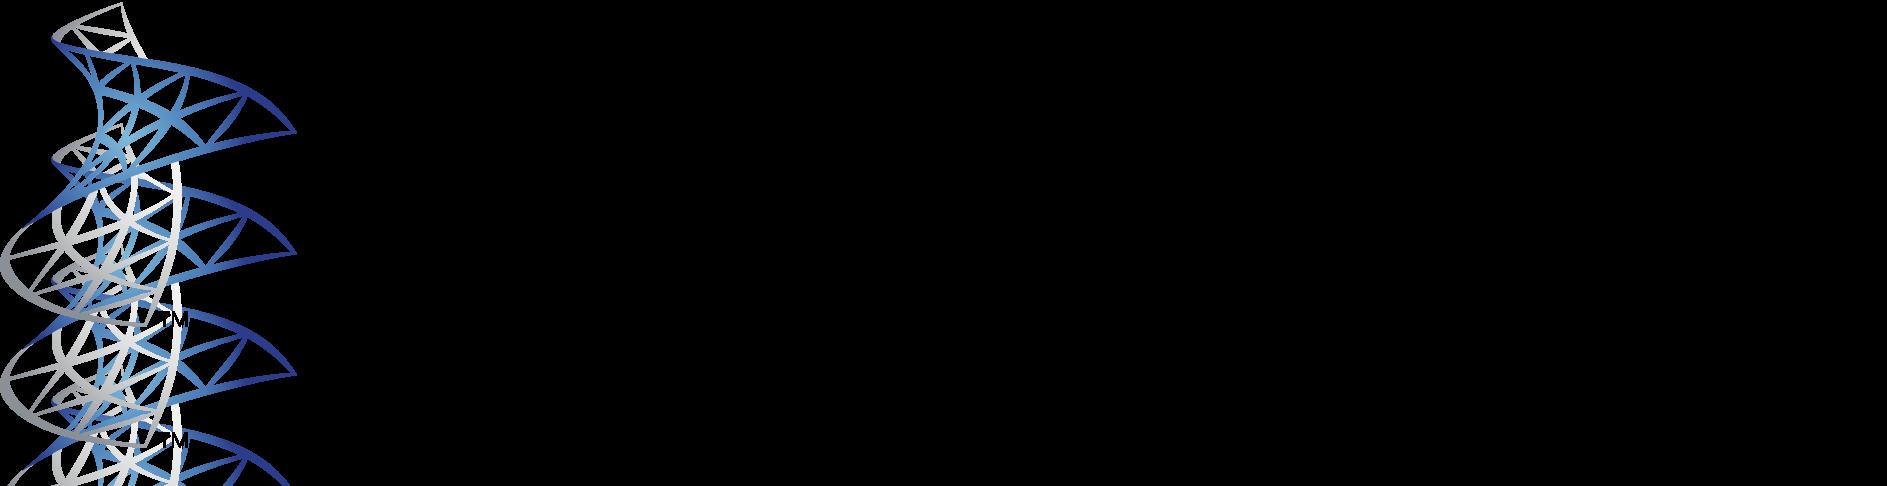 System Center Configuration Manager 2012 Logo